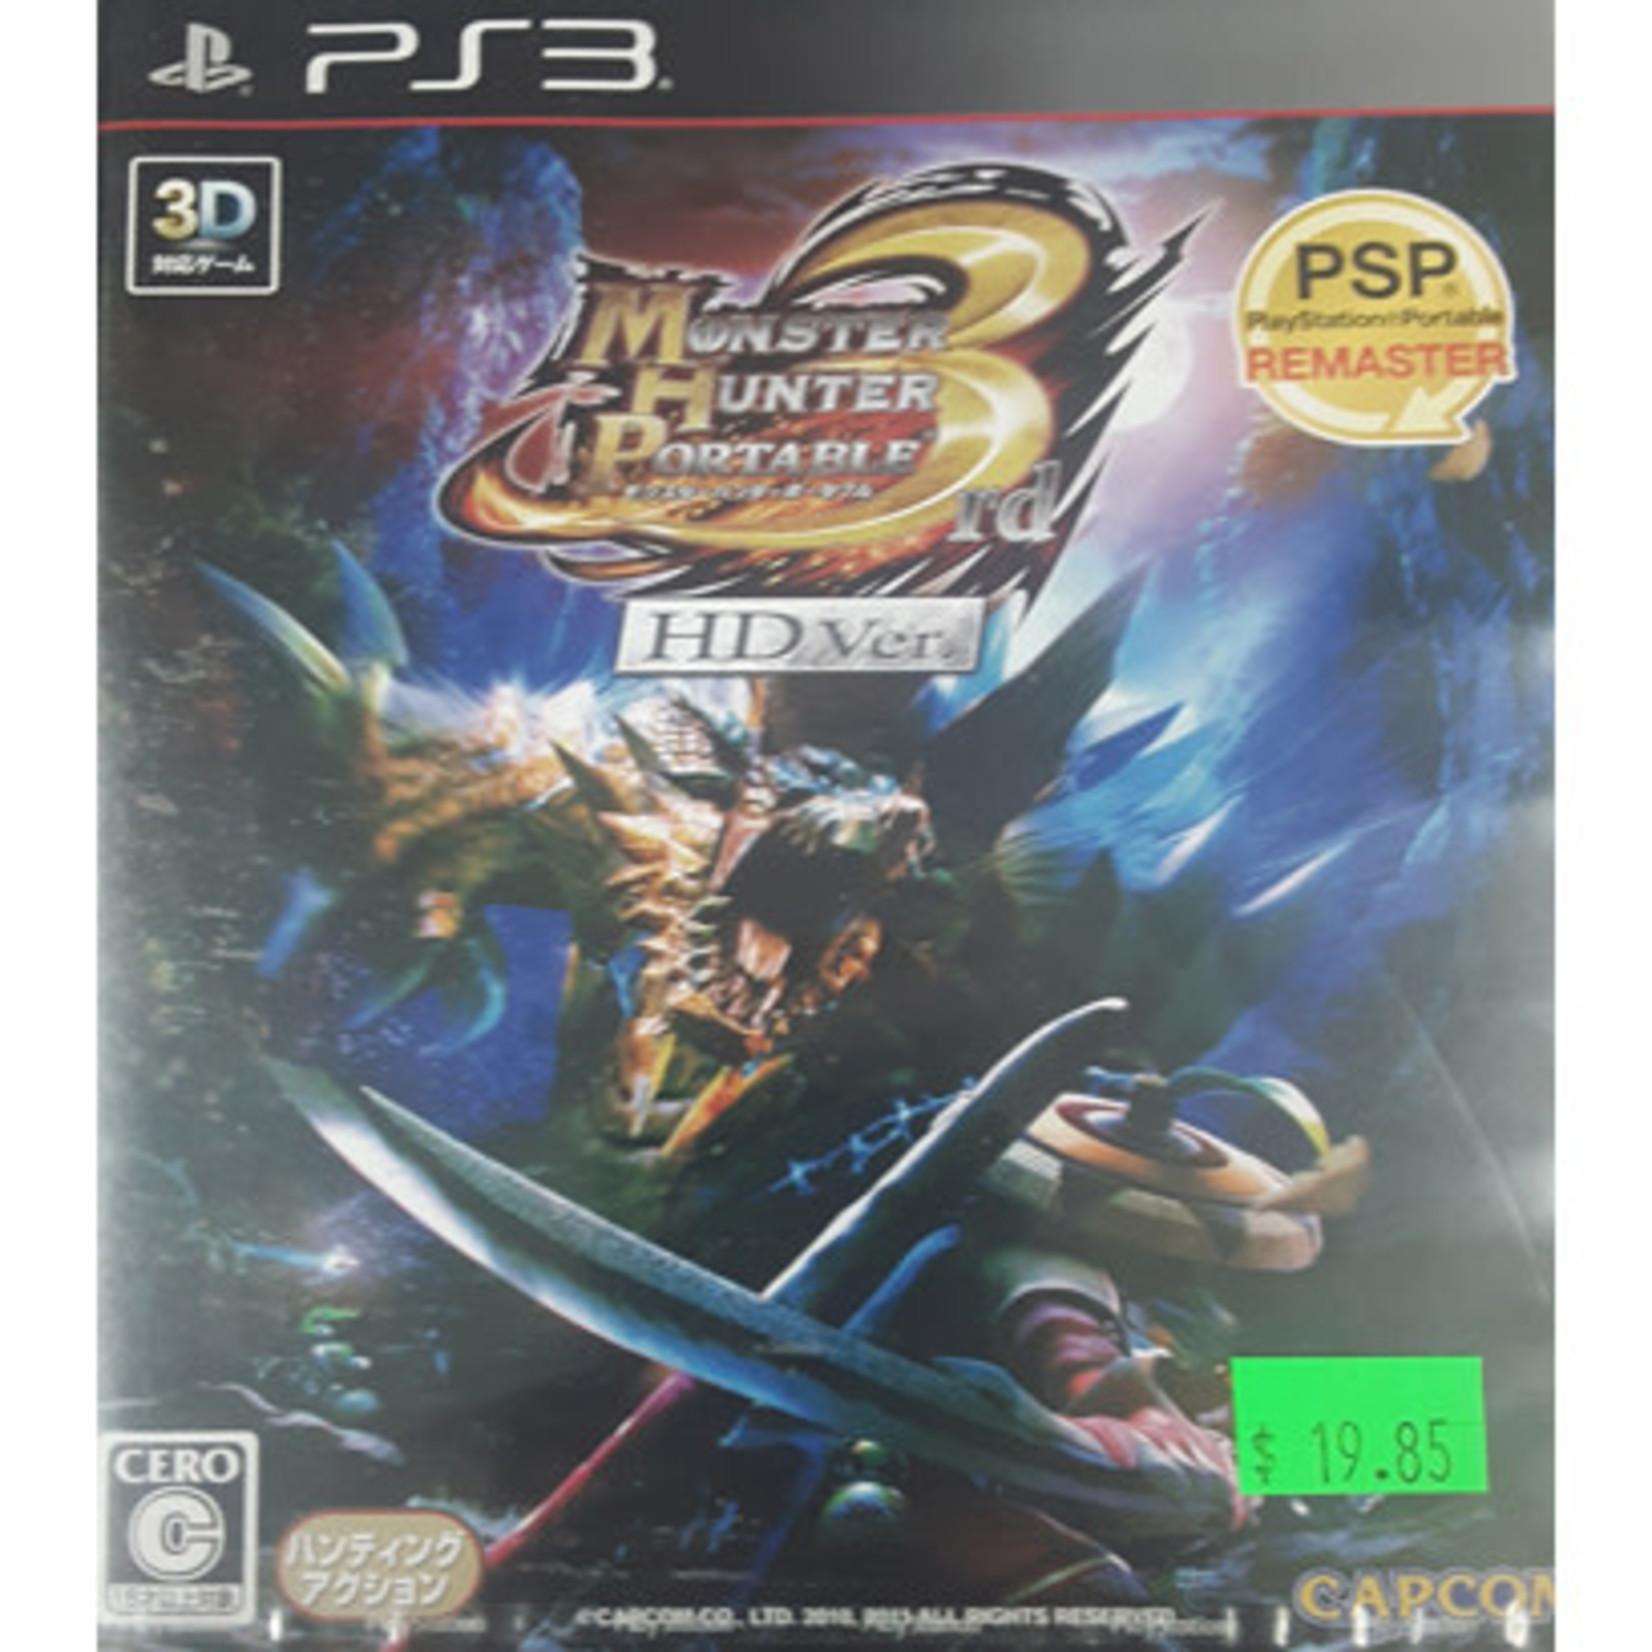 IMPORT-PS3u-Monster Hunter Portable 3rd